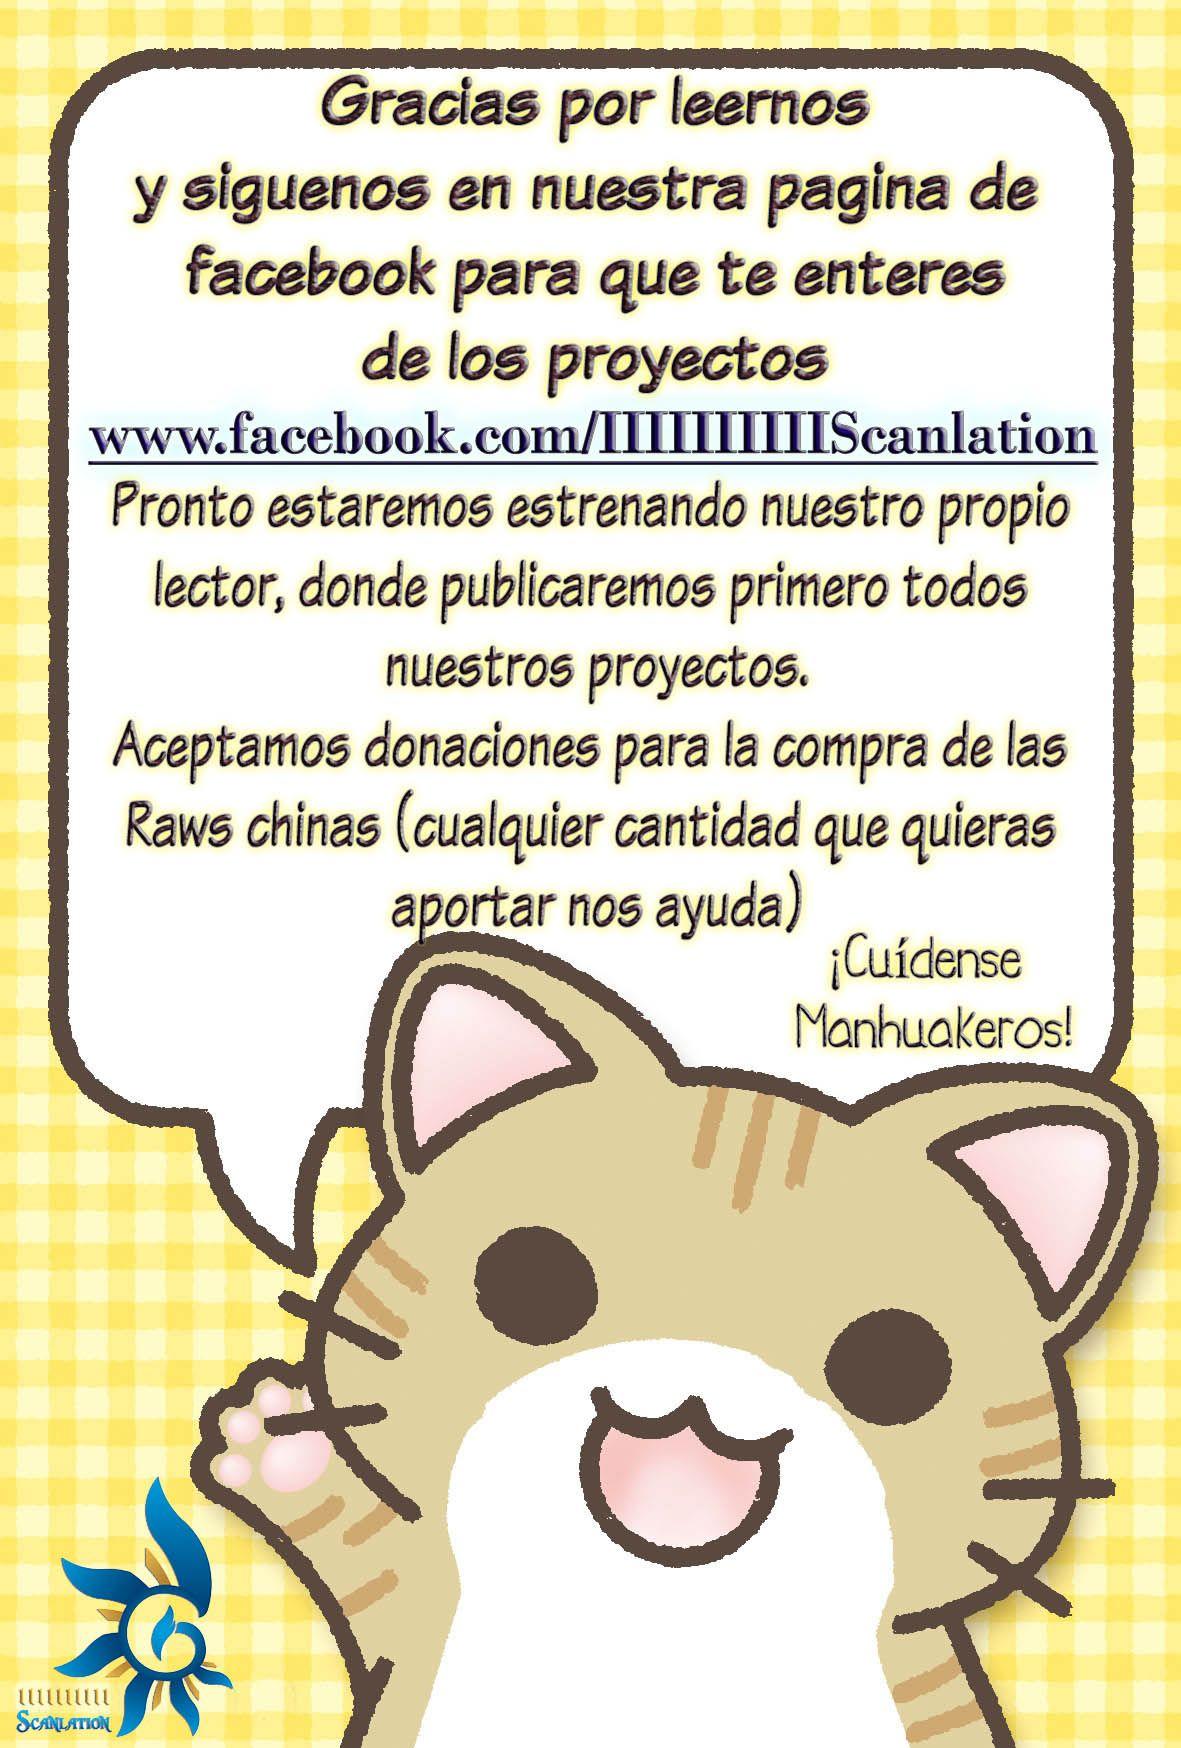 http://c5.ninemanga.com/es_manga/7/17735/462591/b5ab90fa9773176f49e9e5c51fbfac9f.jpg Page 12